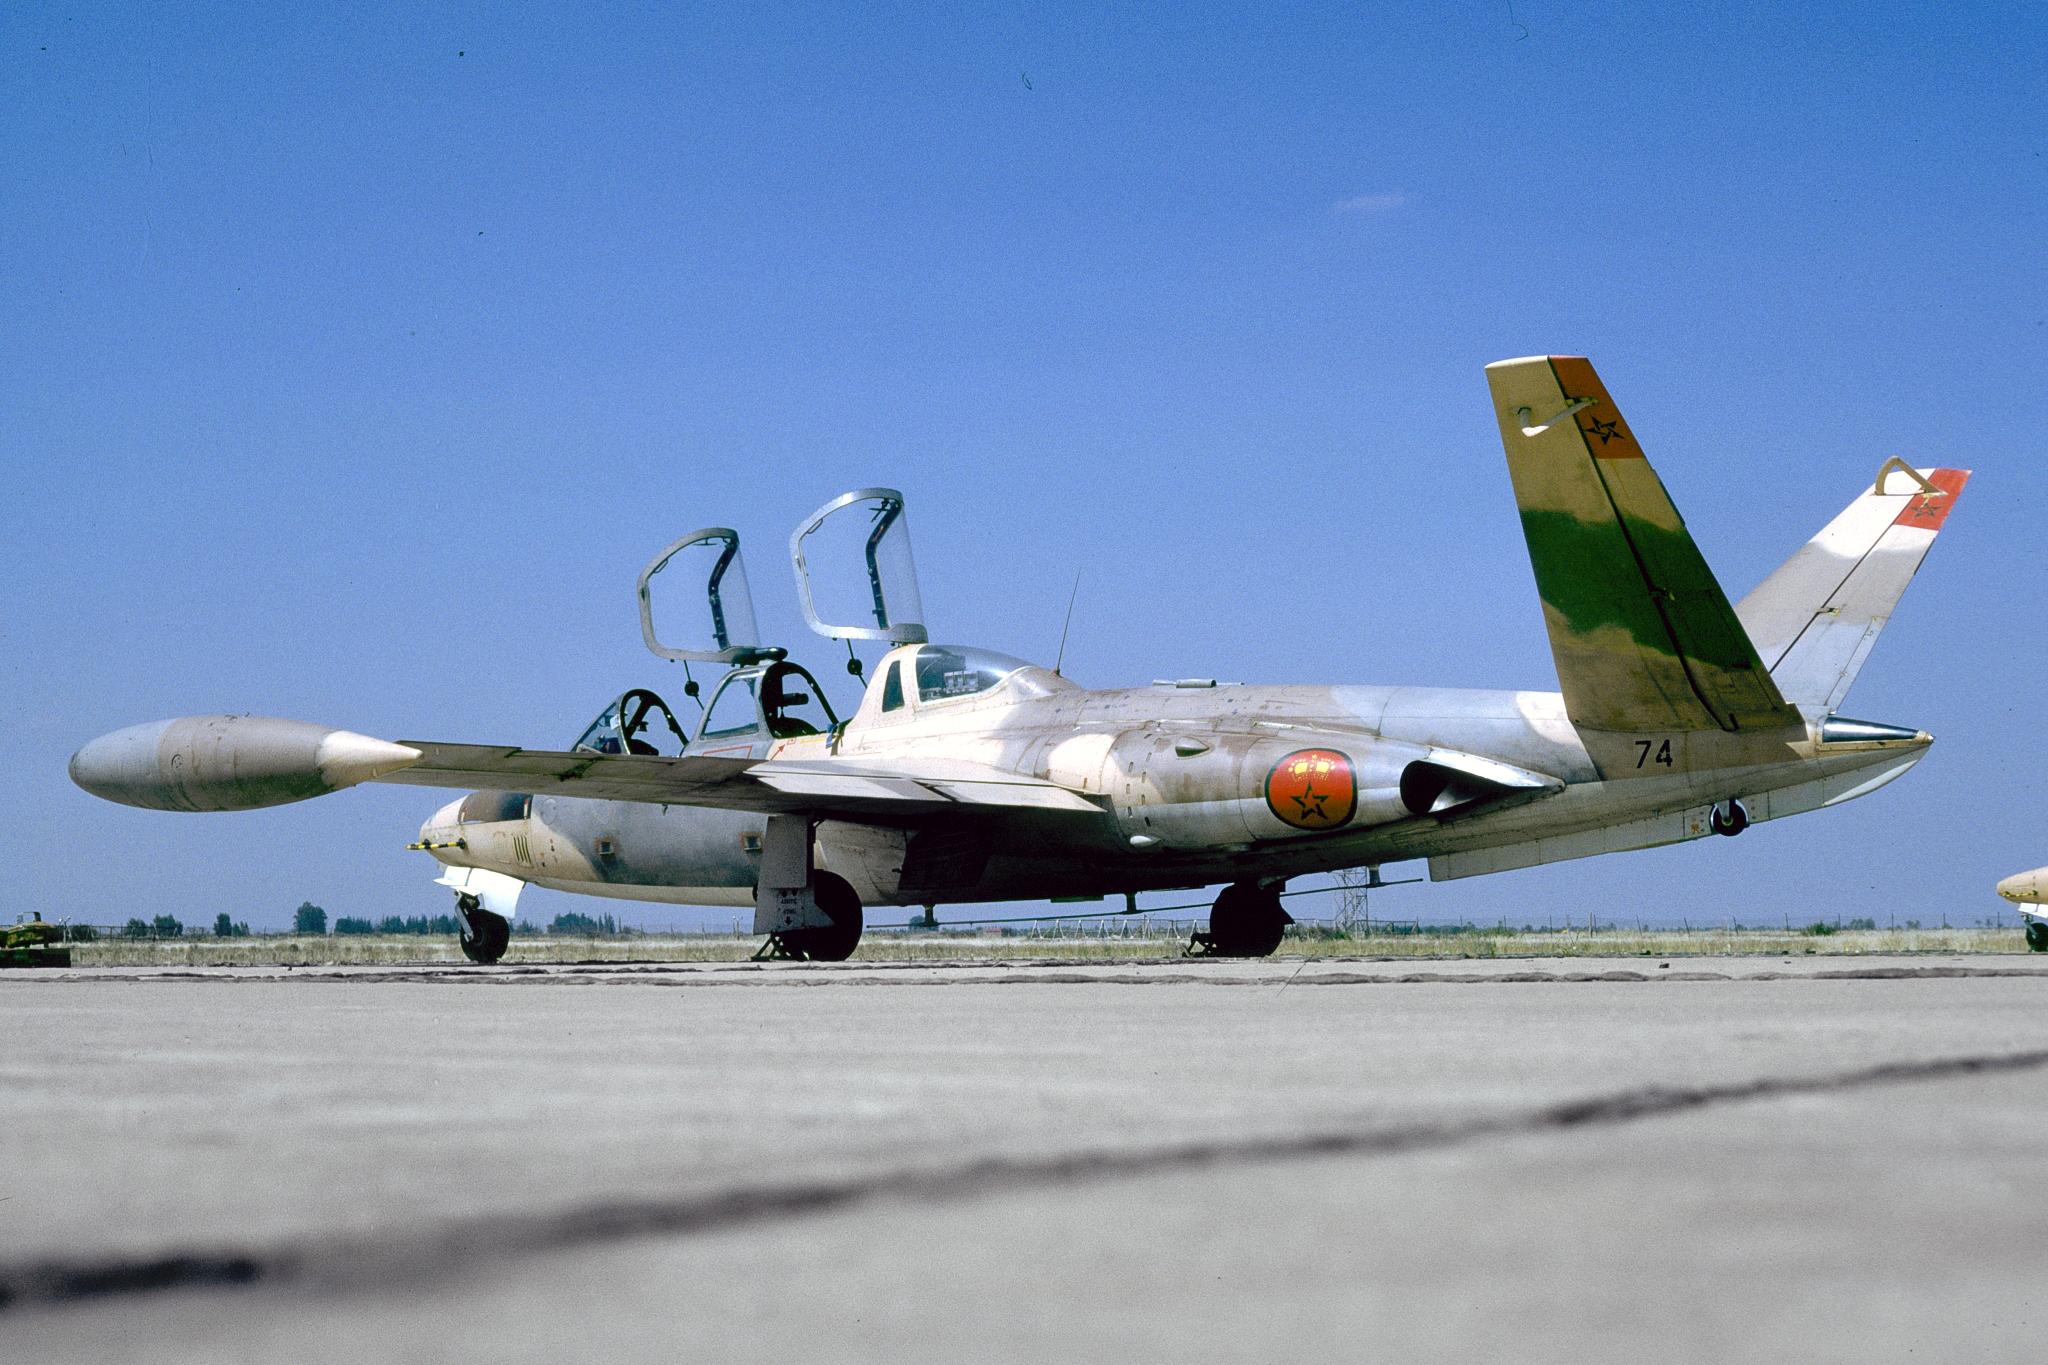 FRA: Photos anciens avions des FRA - Page 13 46984302672_106a3540fc_o